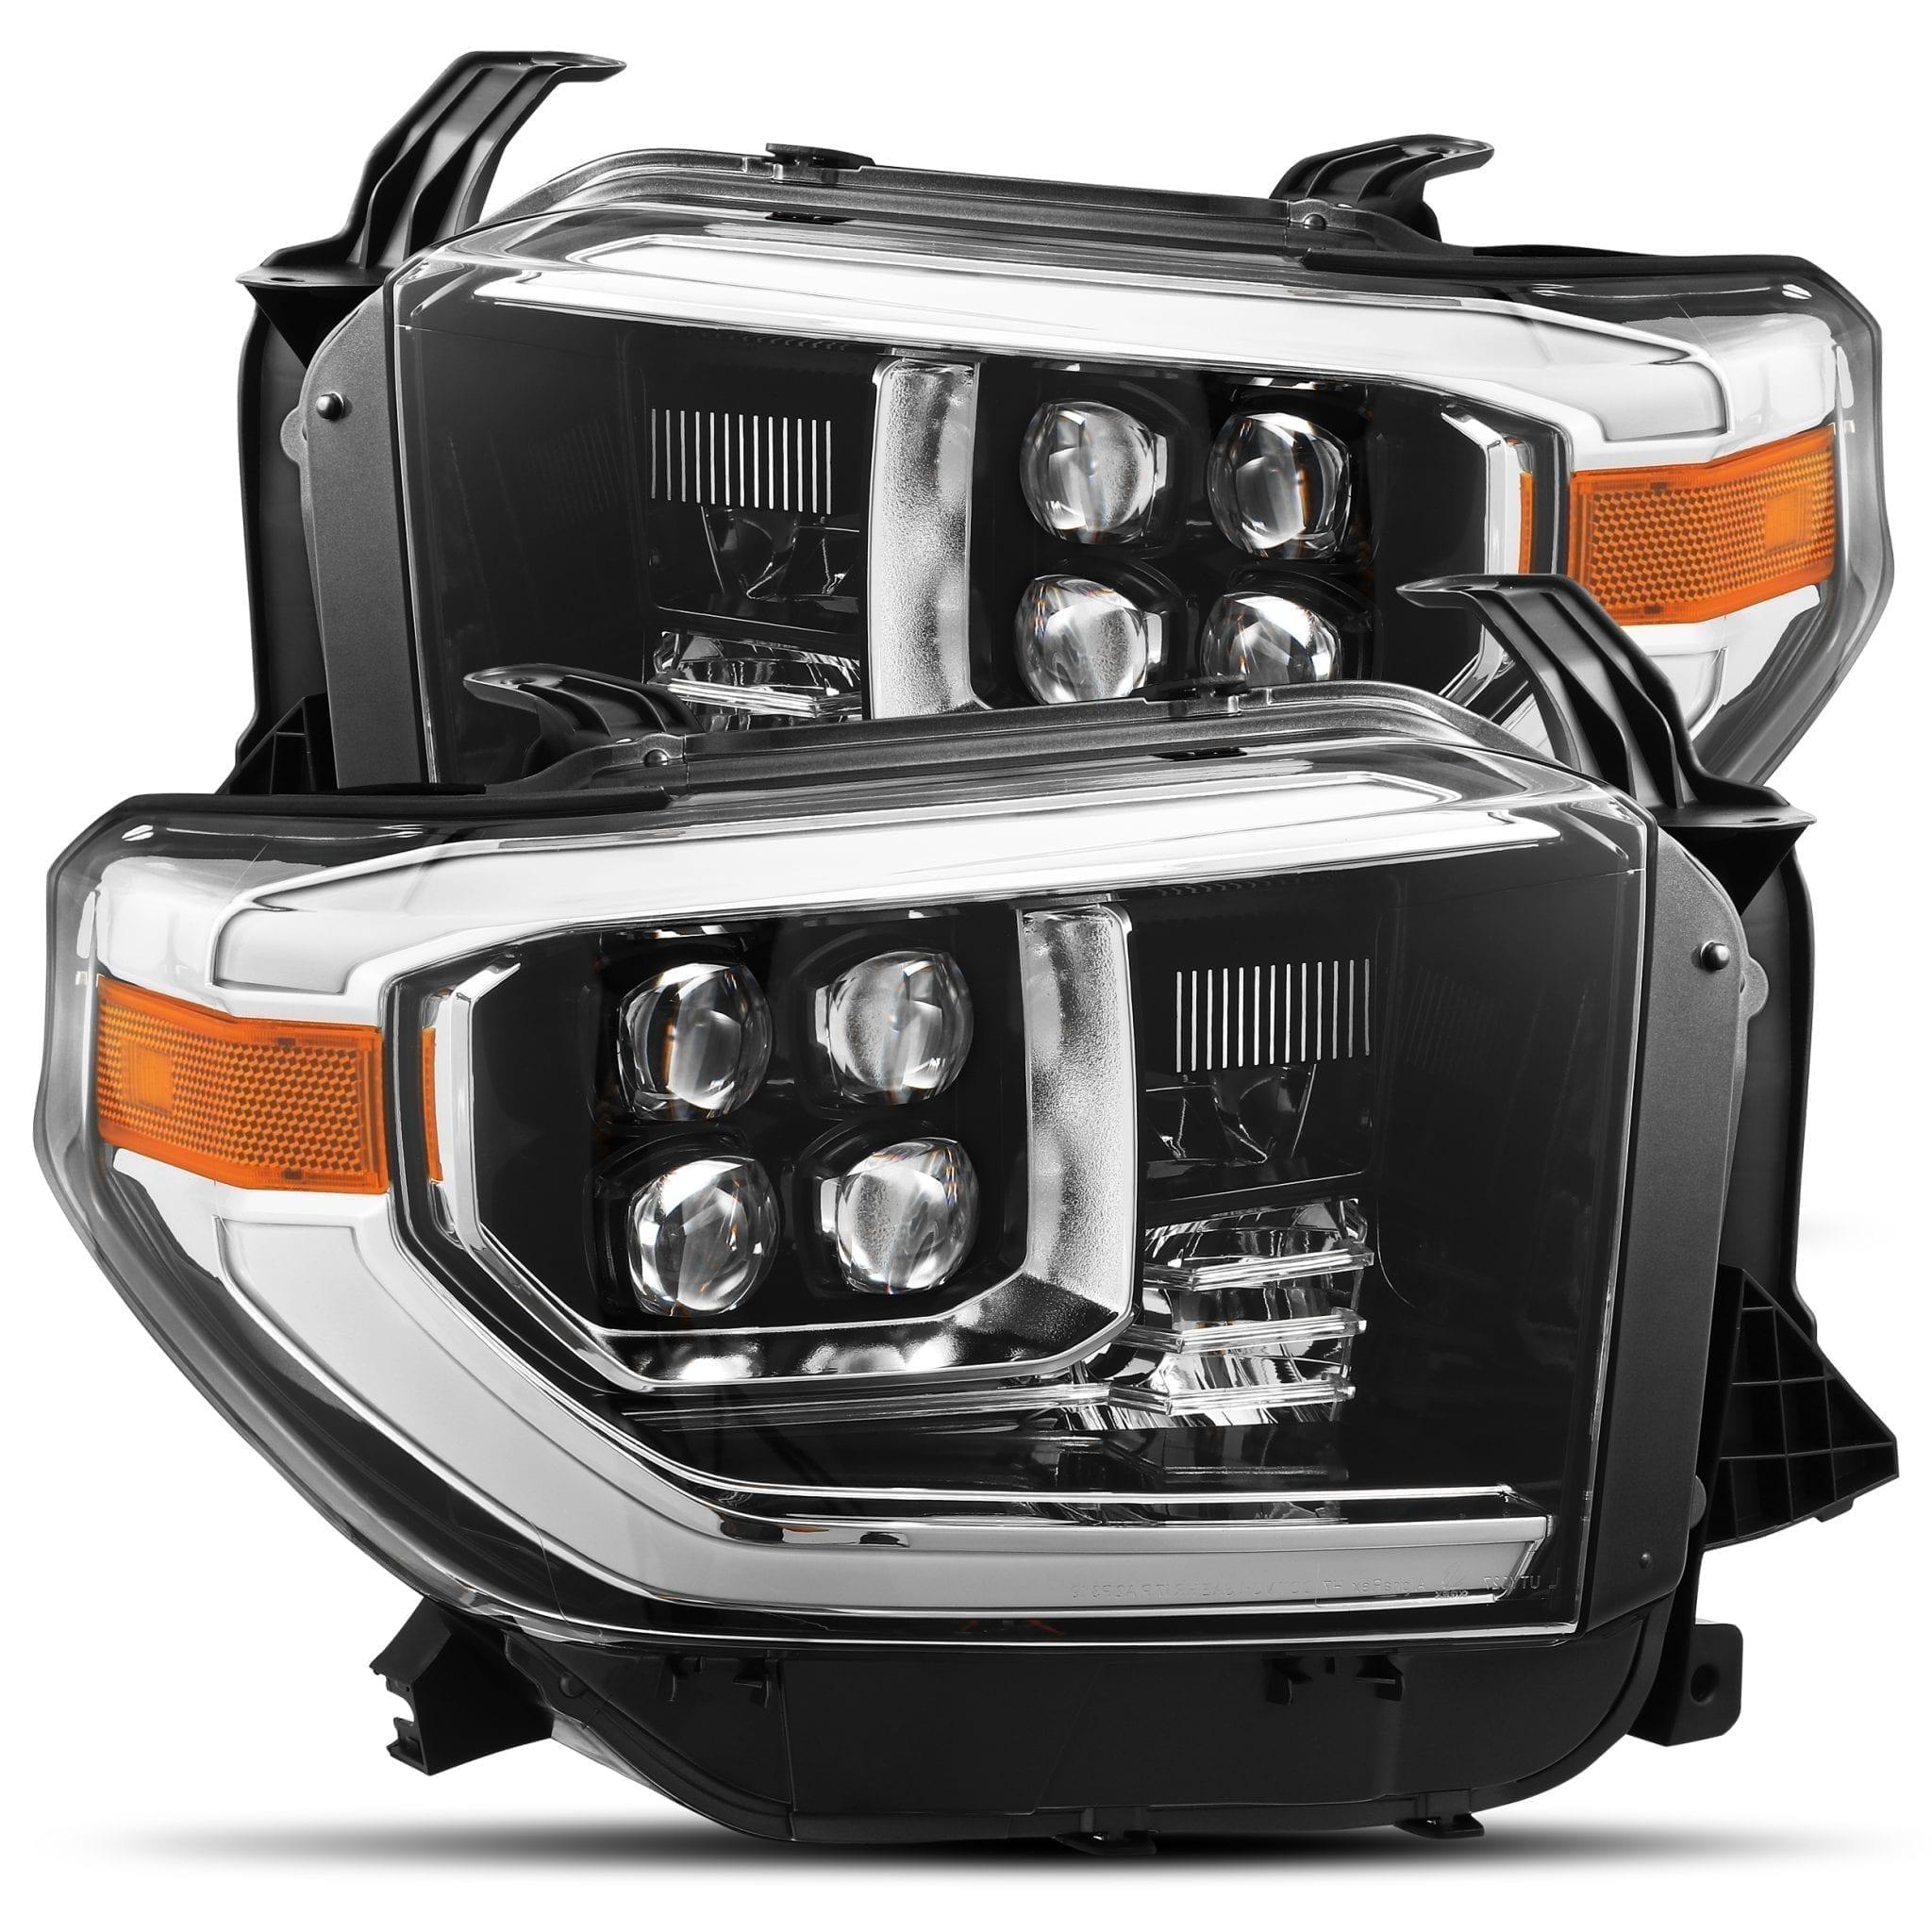 2014 2015 2016 2017 2018 2019 Toyota Tundra NOVA-Series Full LED Projector Headlights Jet Black